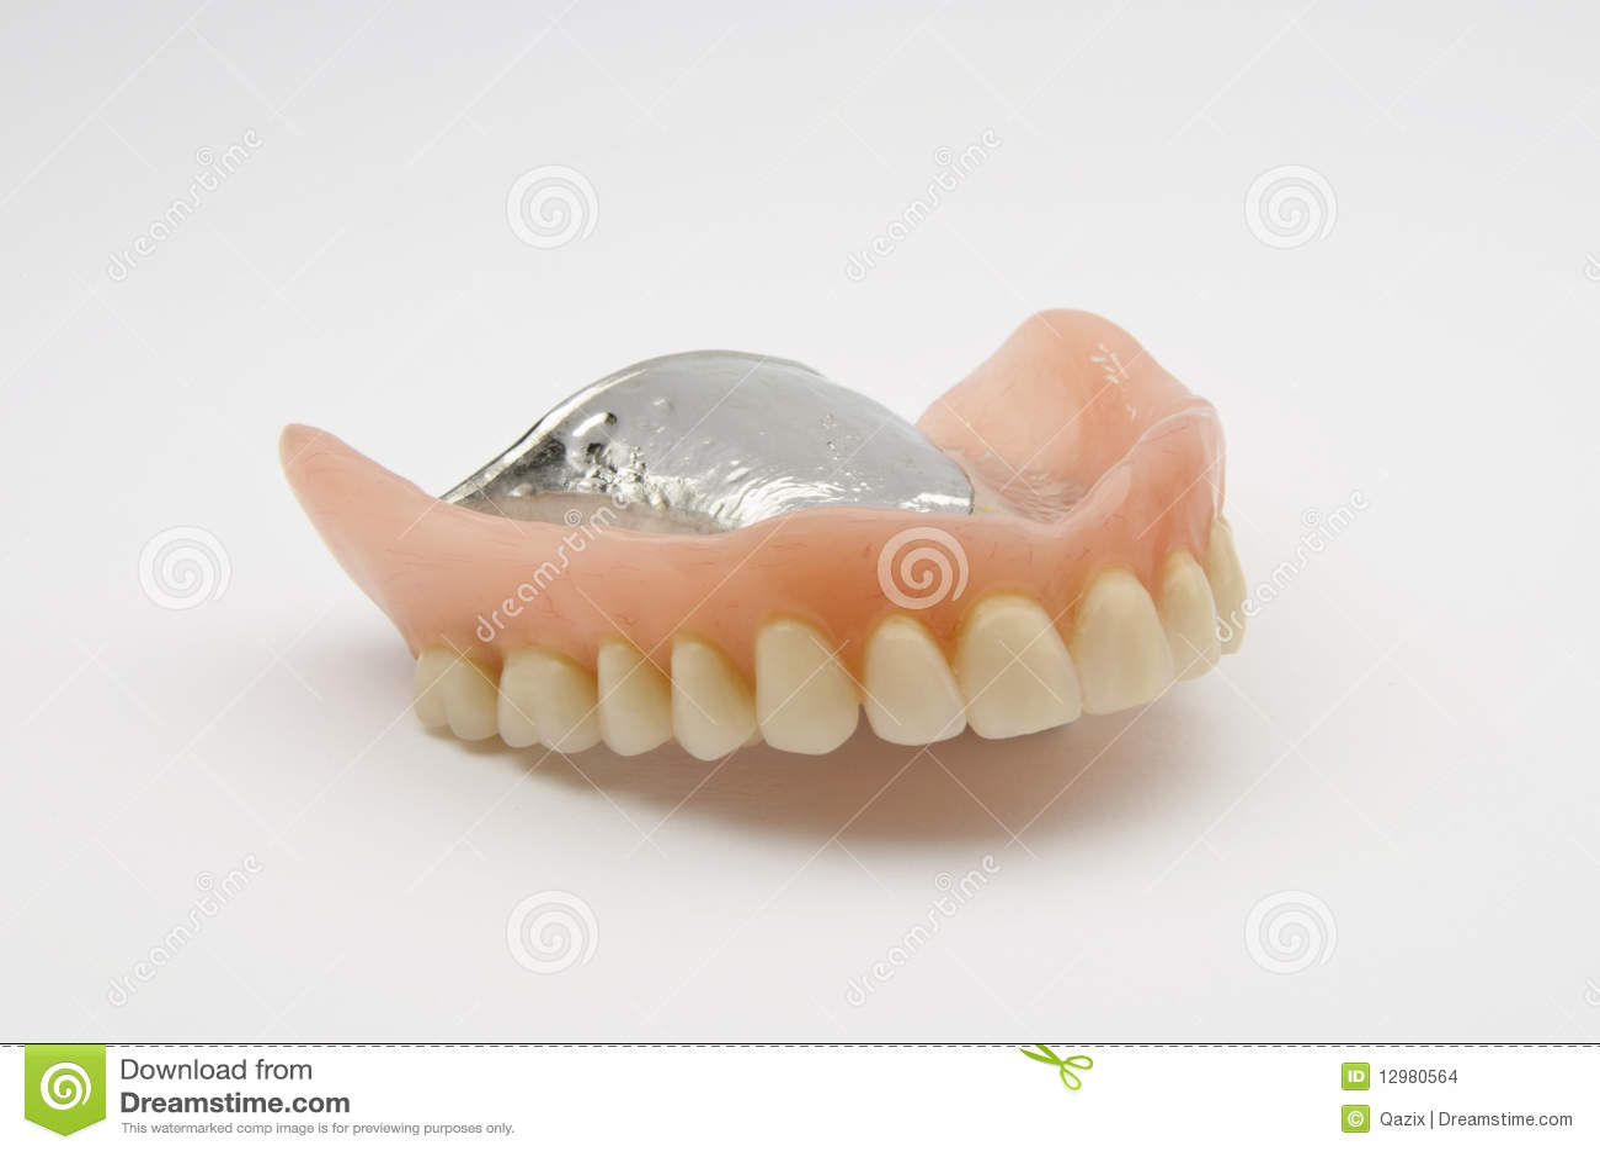 dental prothesis